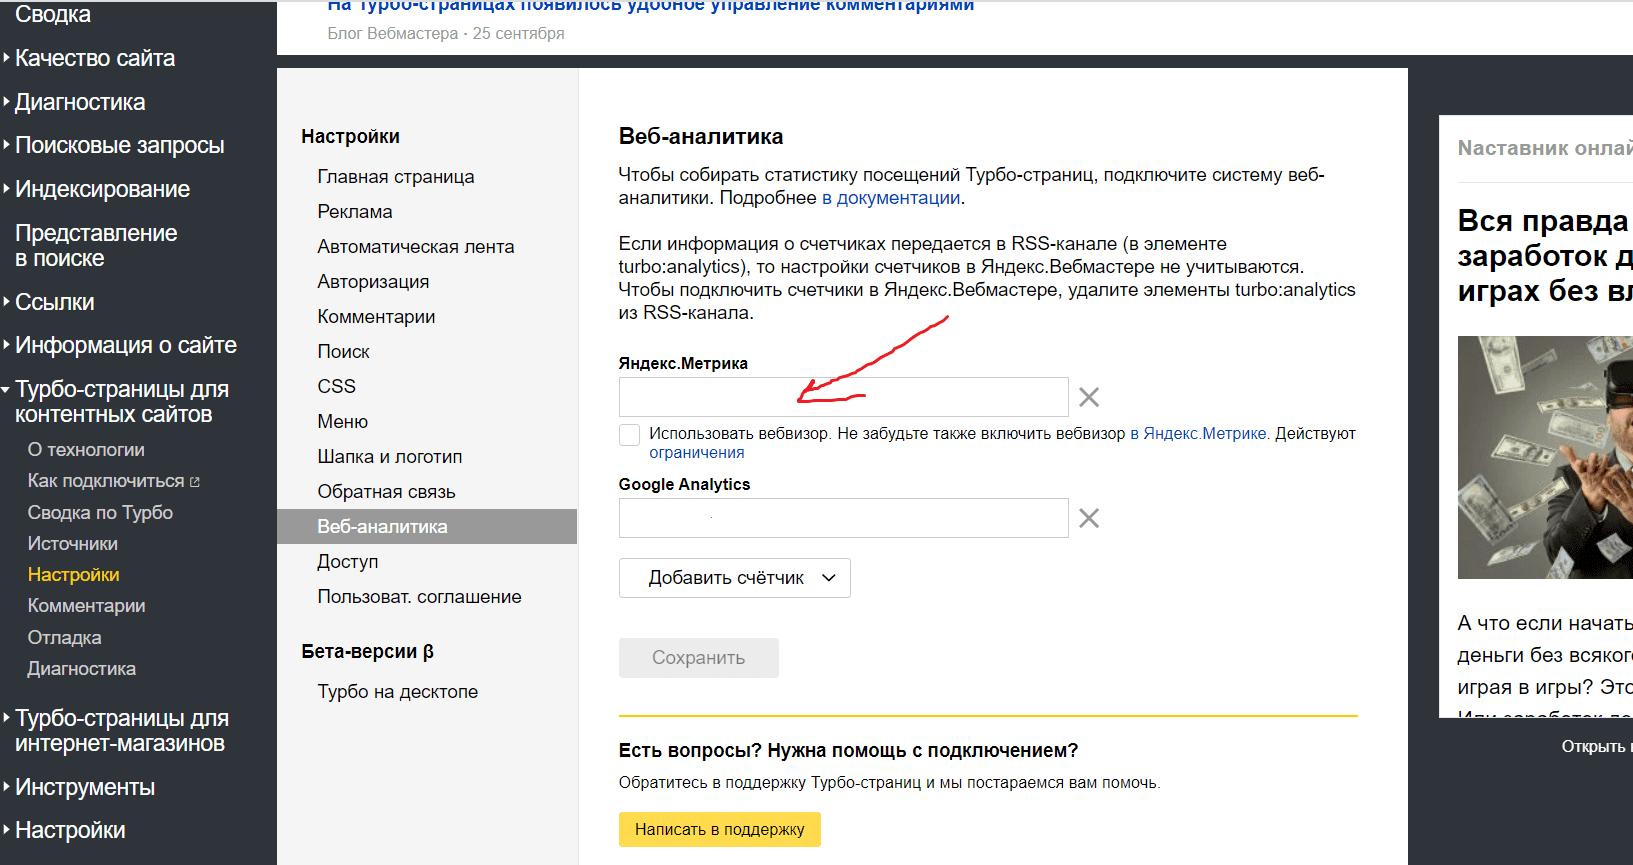 Счетчики Яндекс Метрики для Турбо-страниц